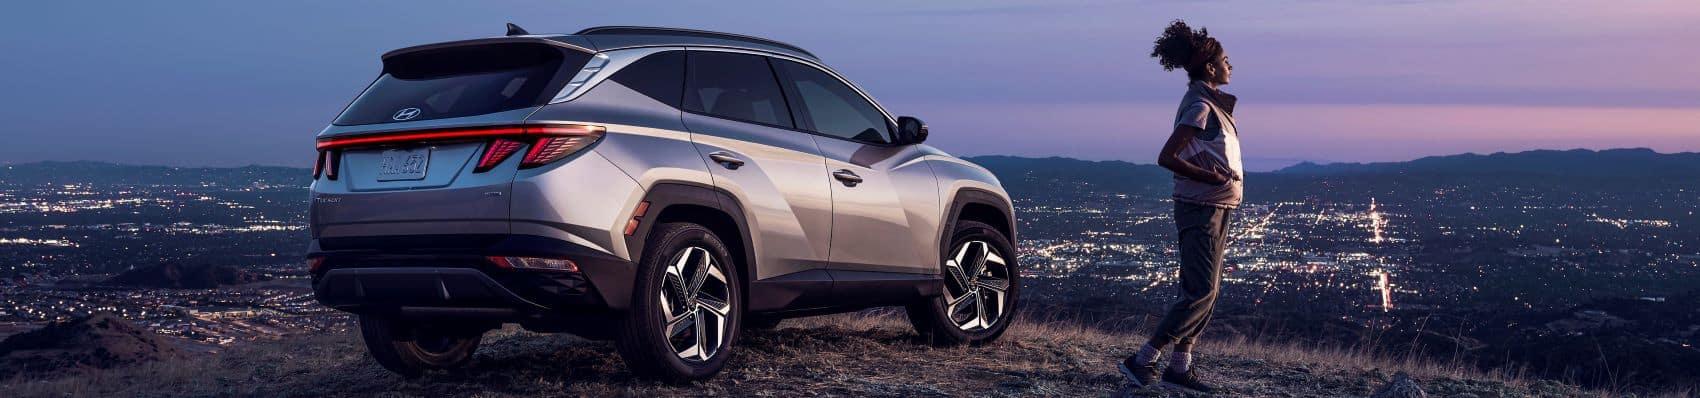 Test Drive The 2022 Hyundai Tucson Today!